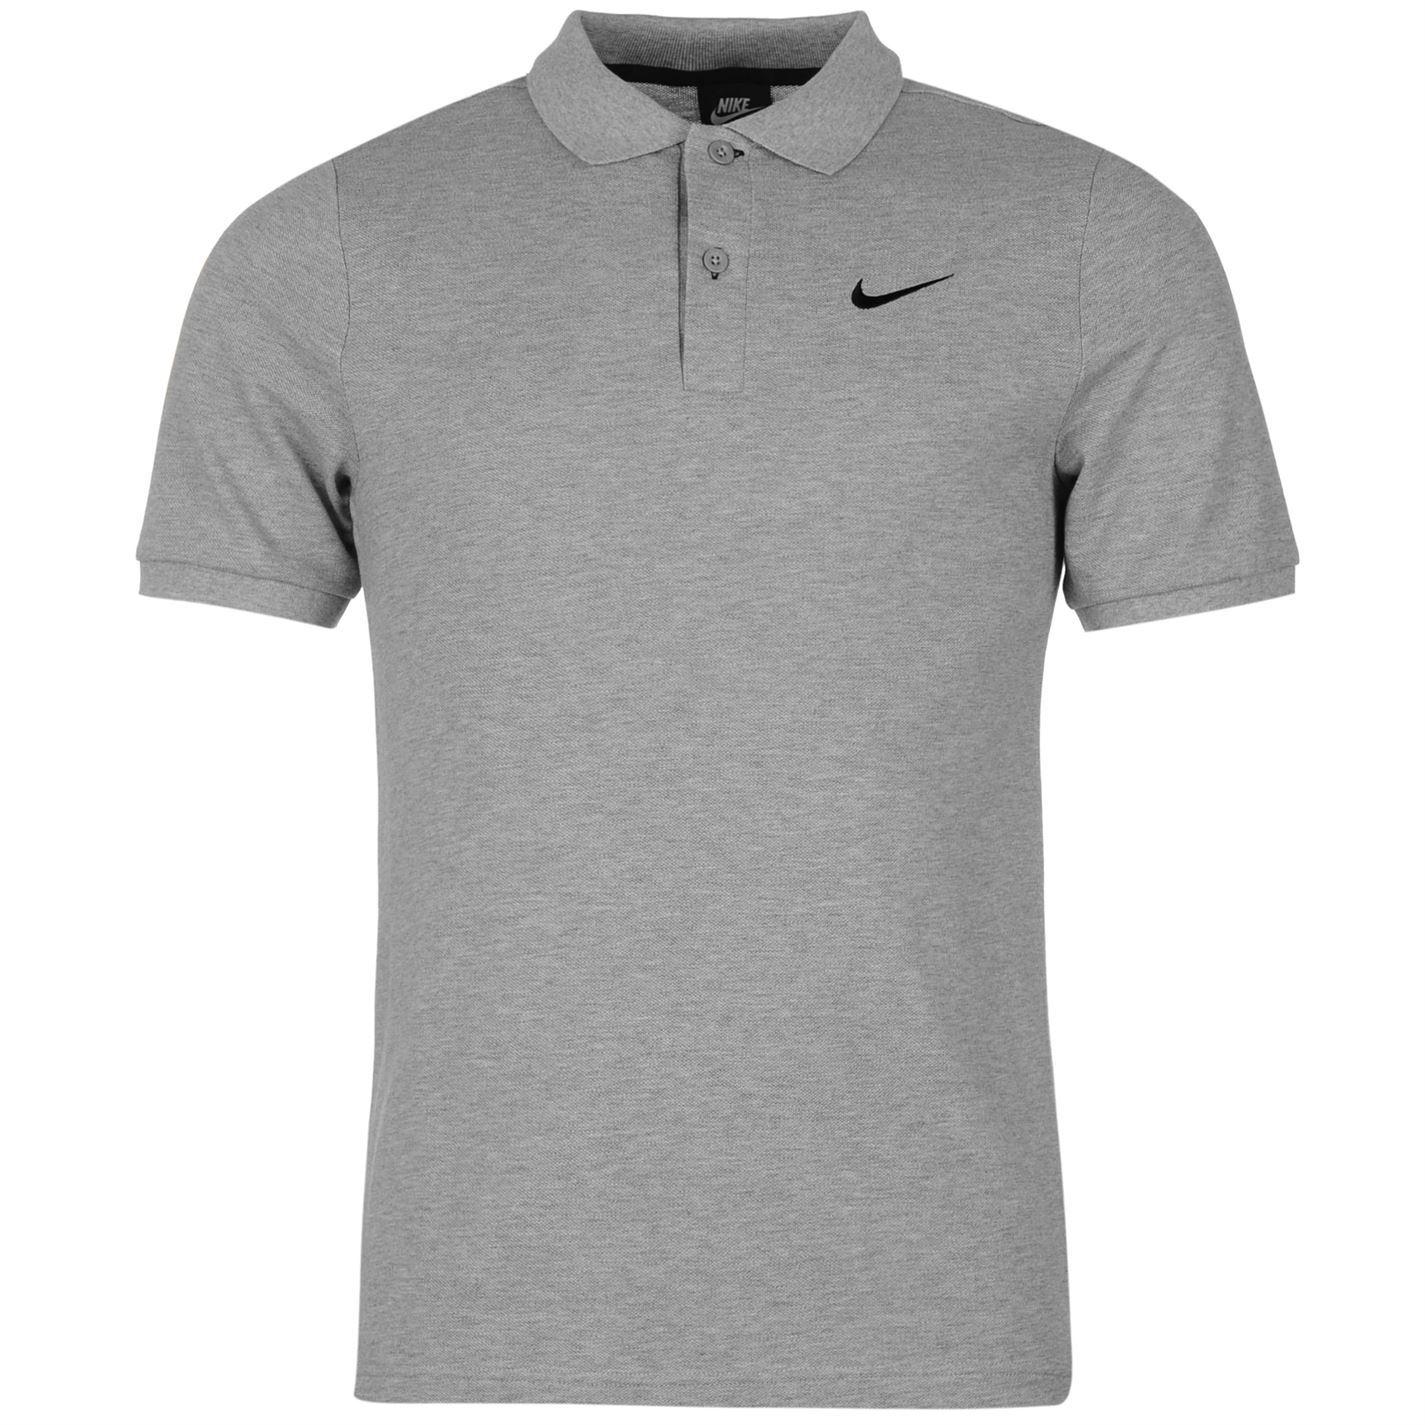 nike pique polo shirt mens grey top t shirt tee ebay